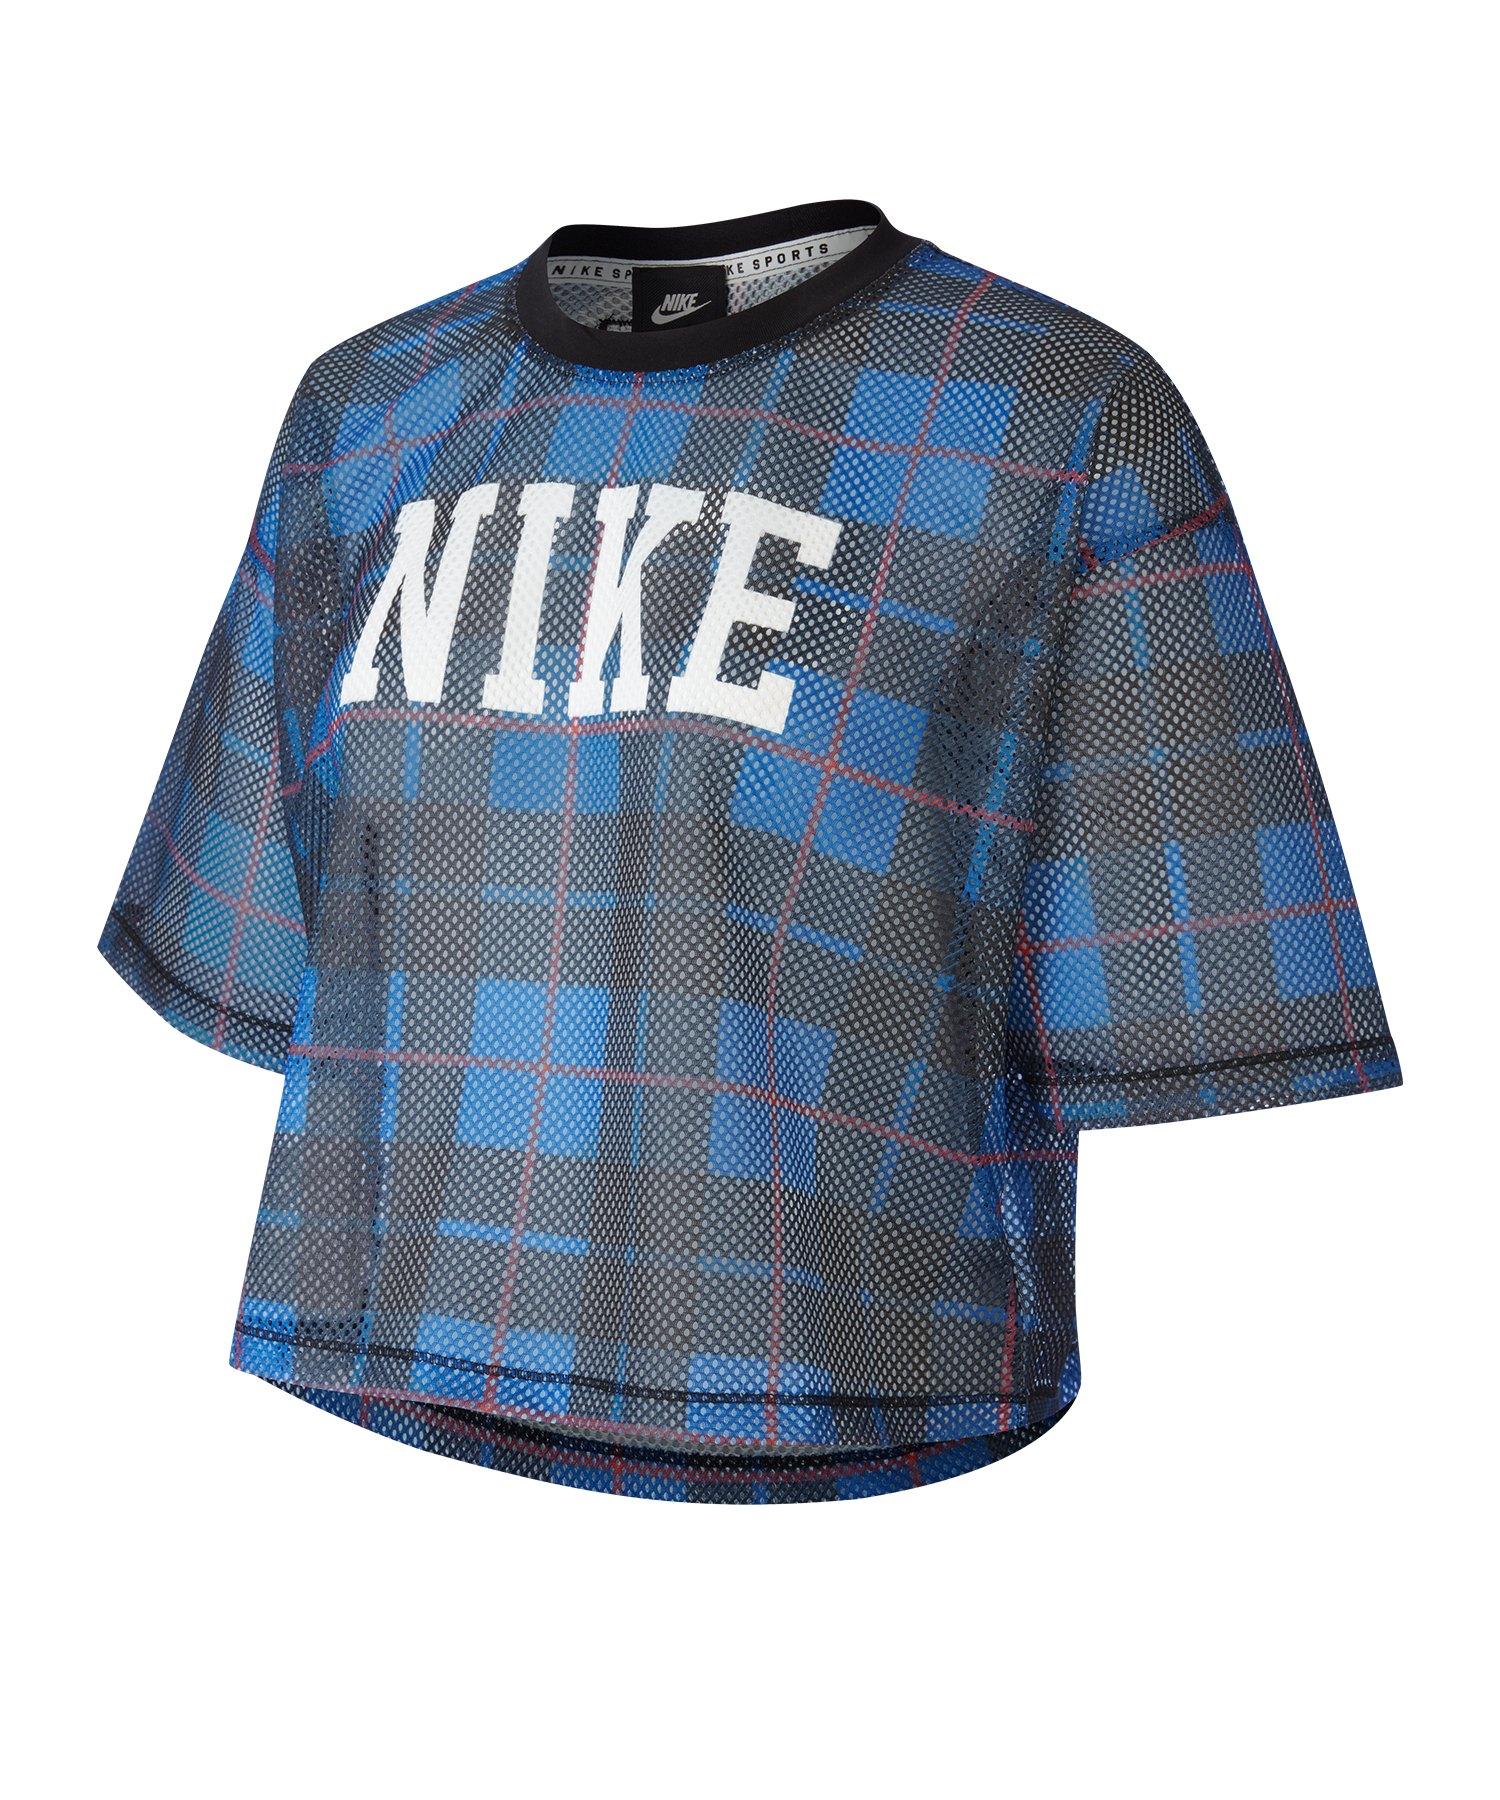 Nike Short-Sleeve Mesh Top Damen F480 - blau